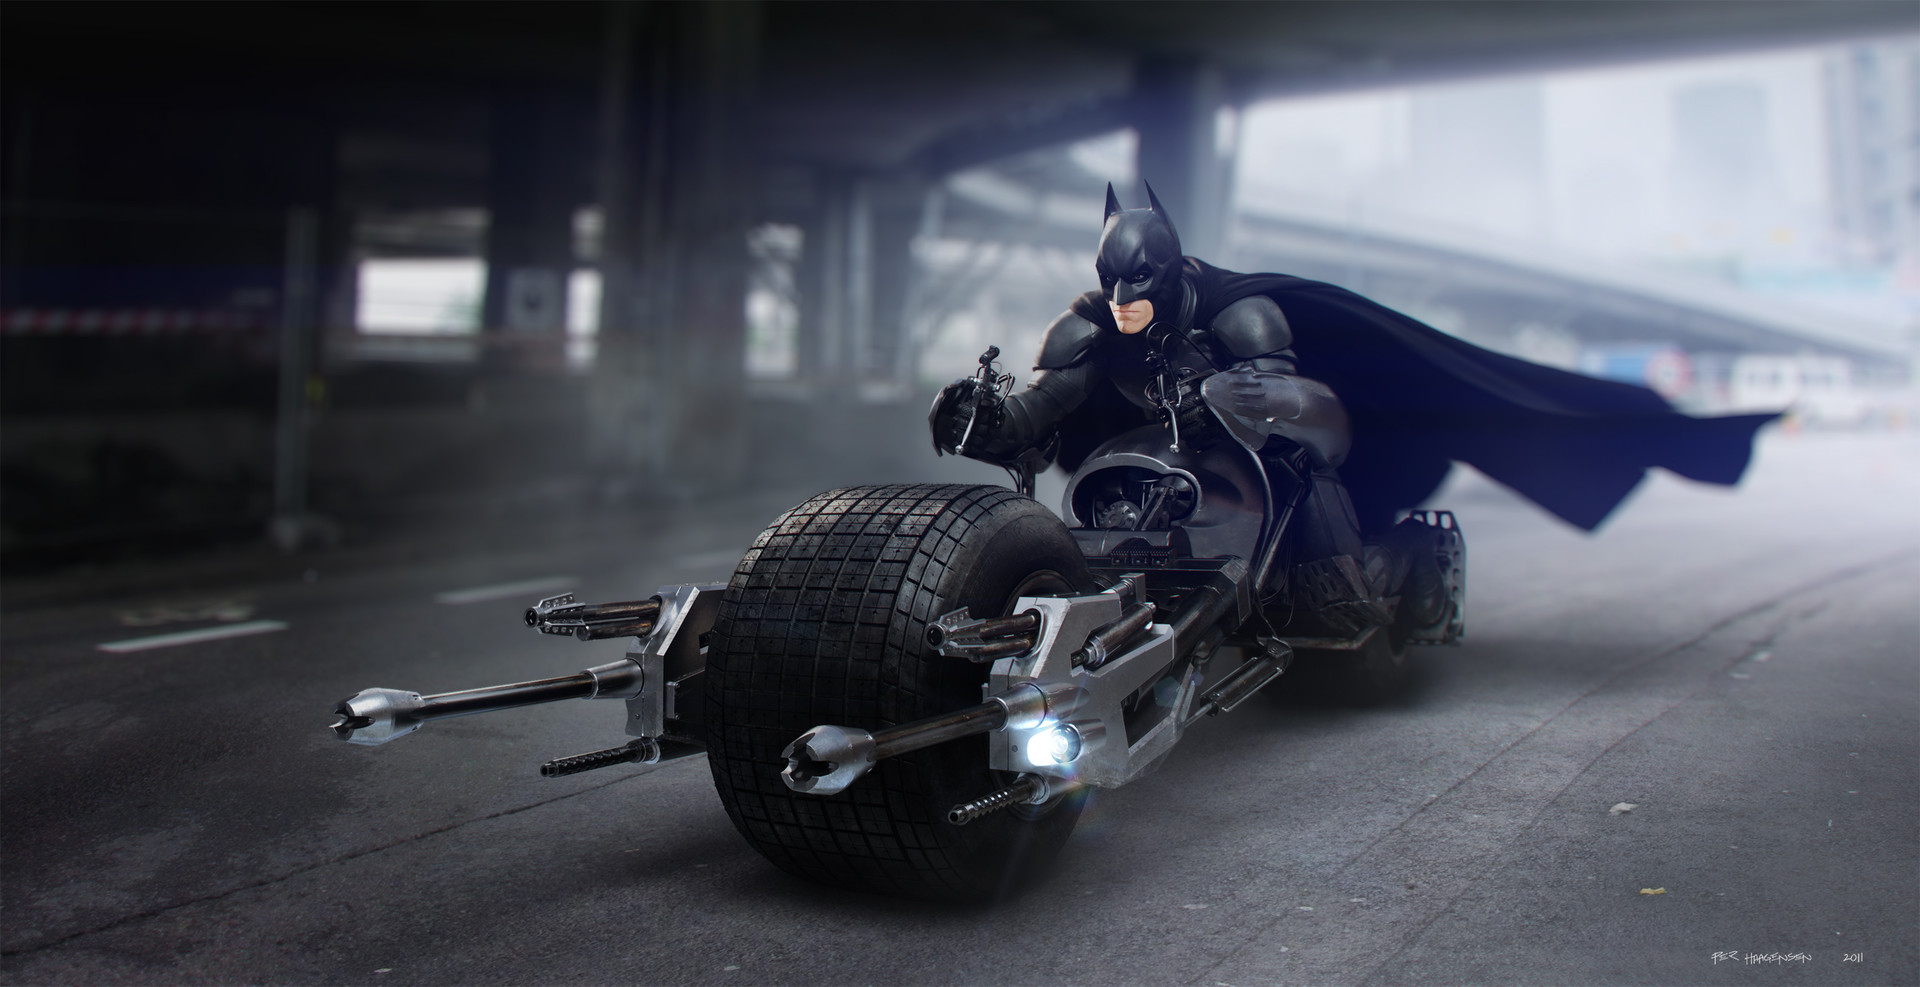 Moto badass The dark knight bat-pod